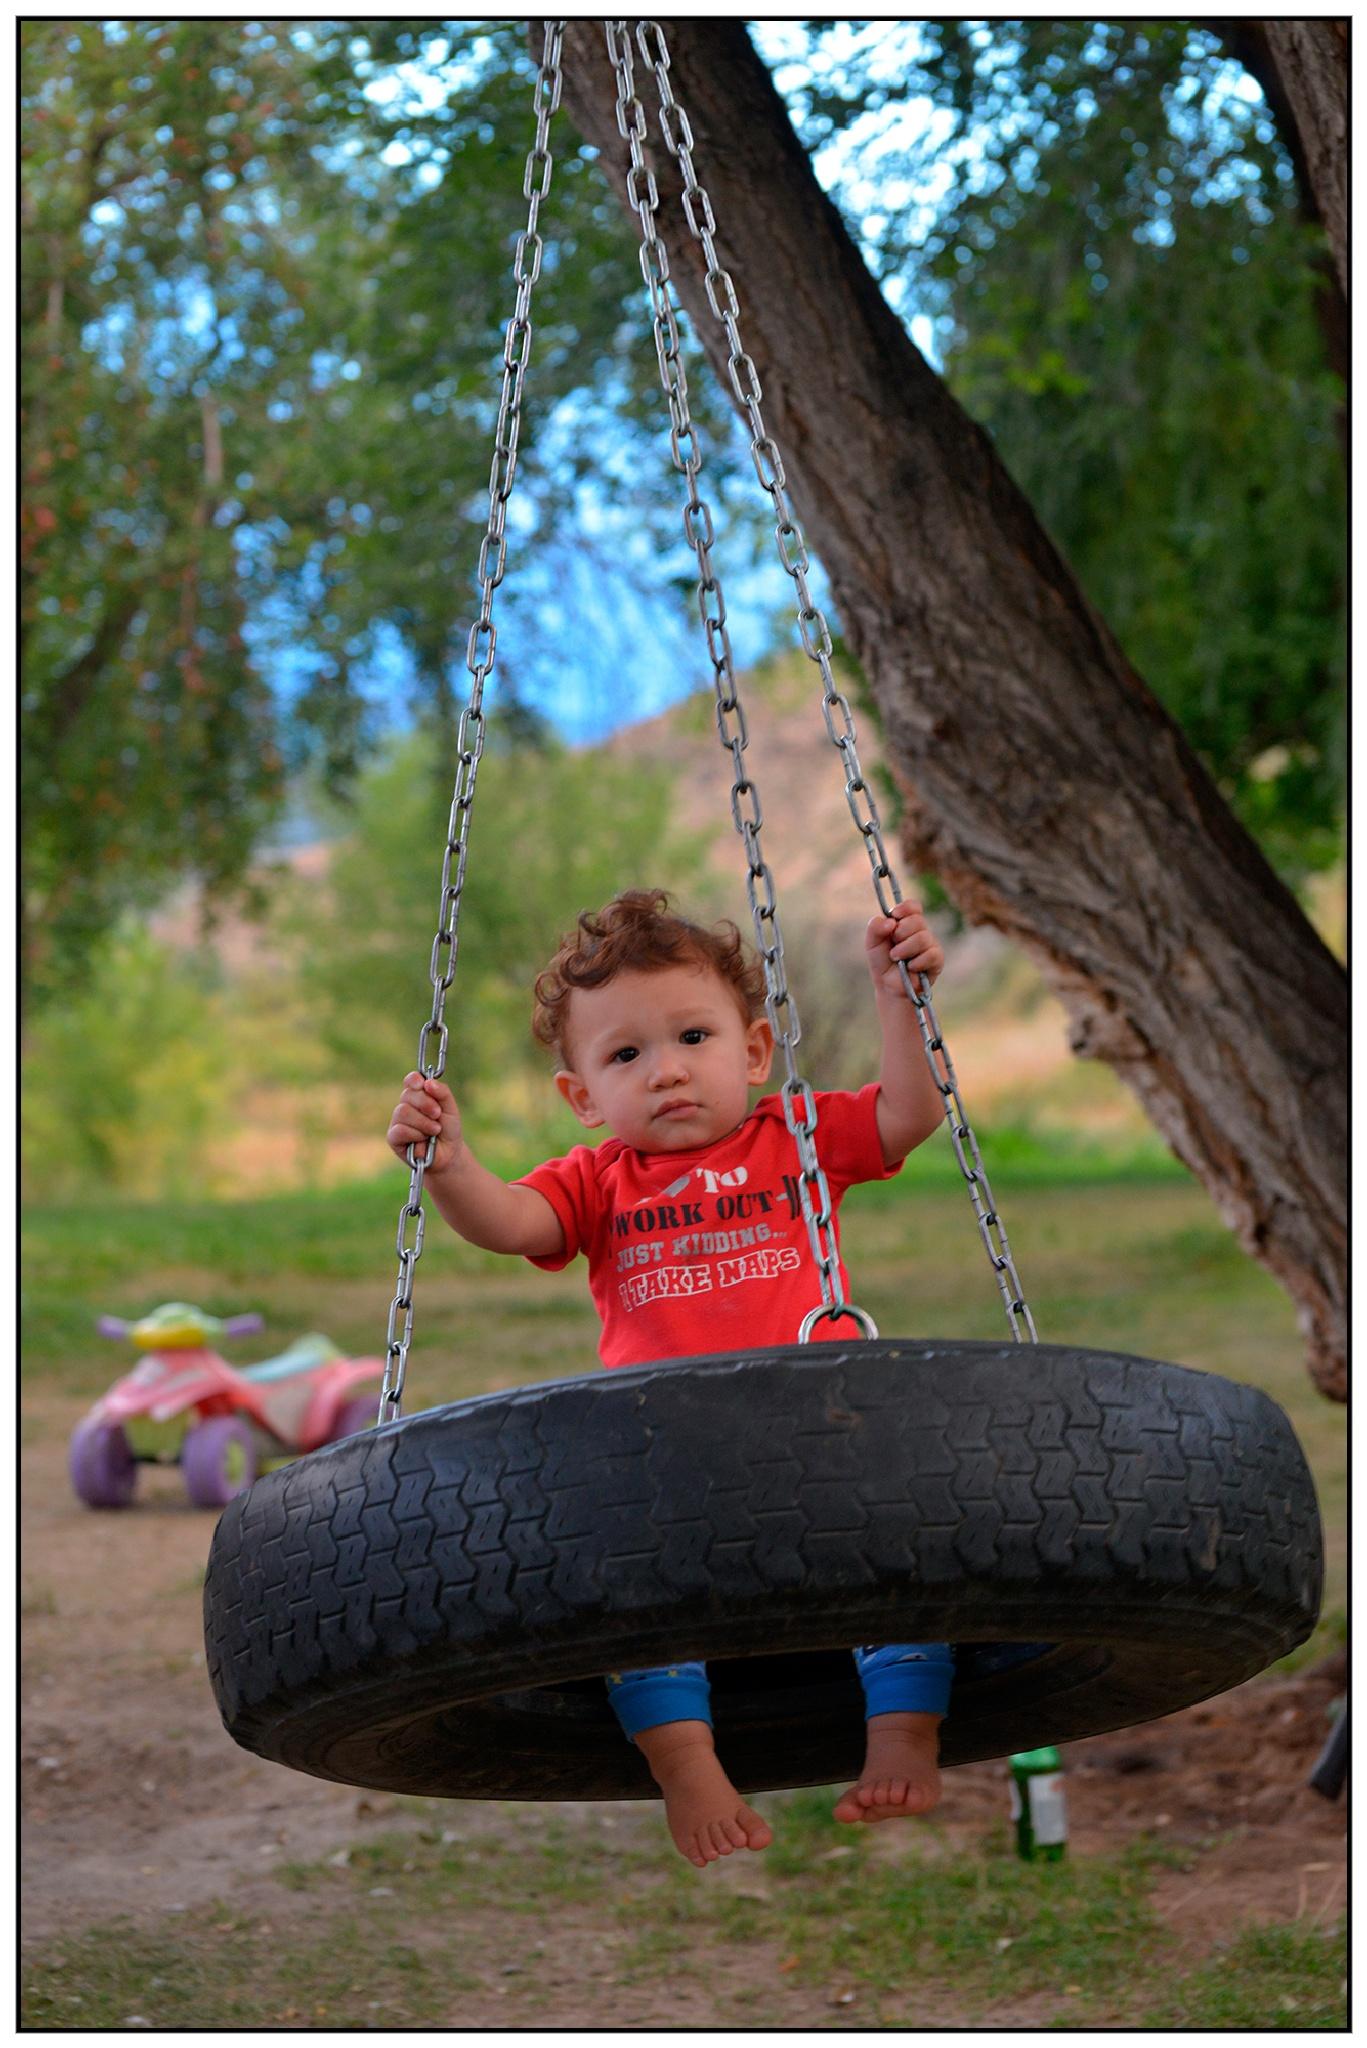 Enjoying the Swing  by Hugo